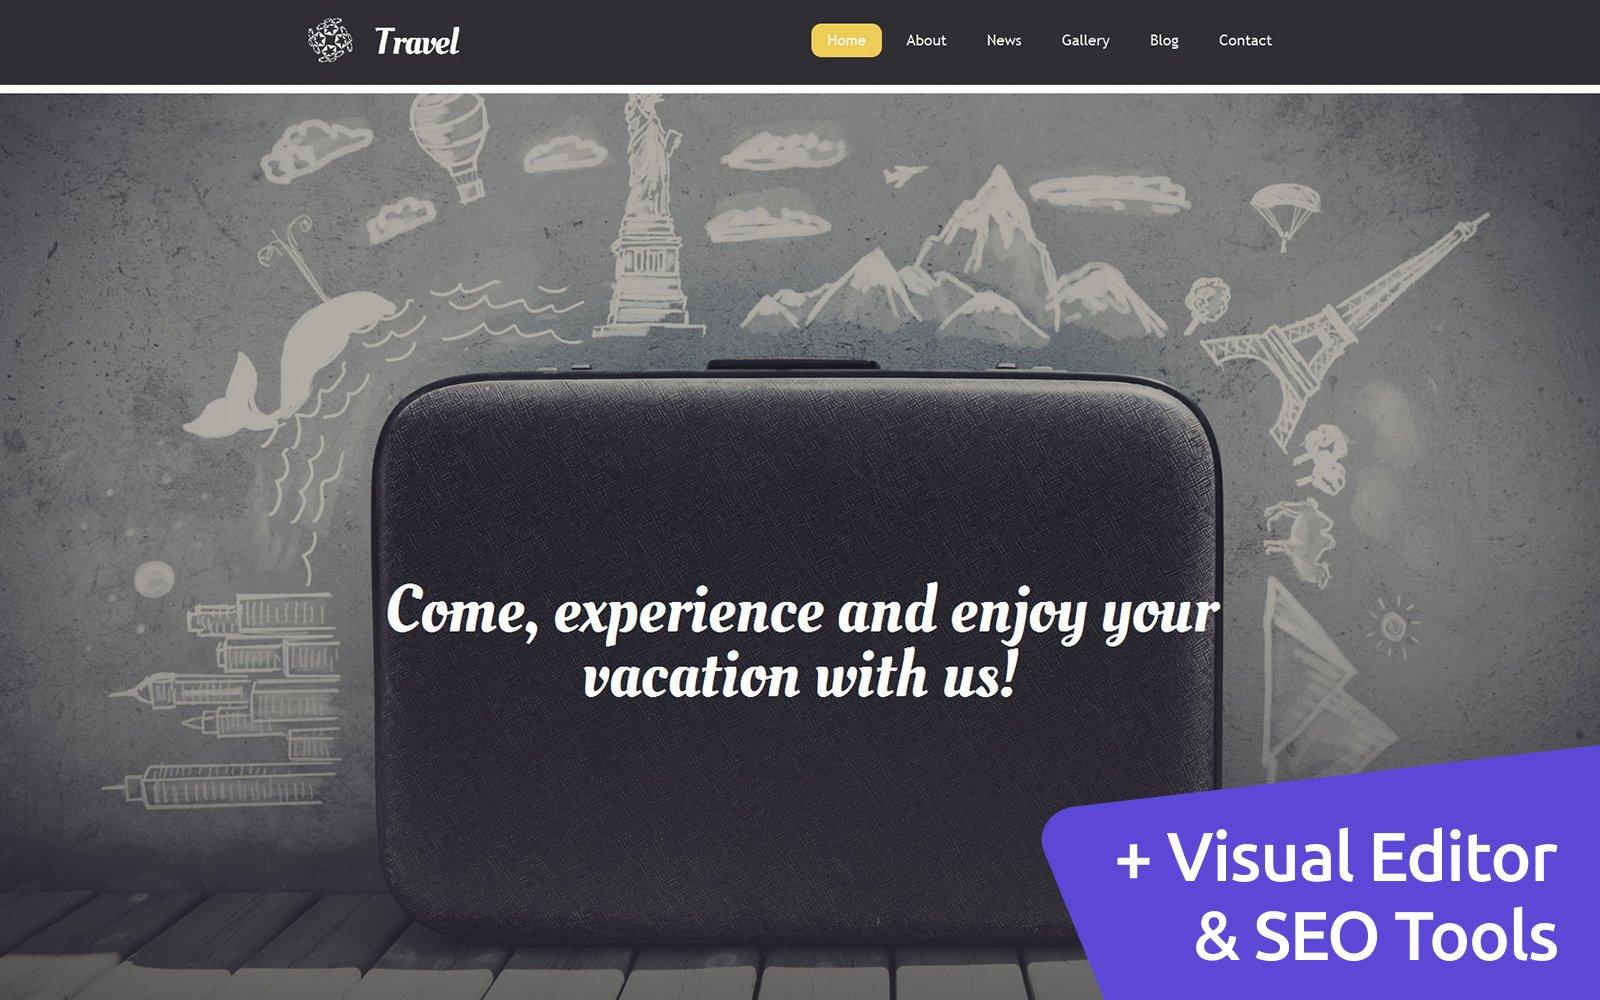 Travel Agency Templates Moto CMS 3 №58795